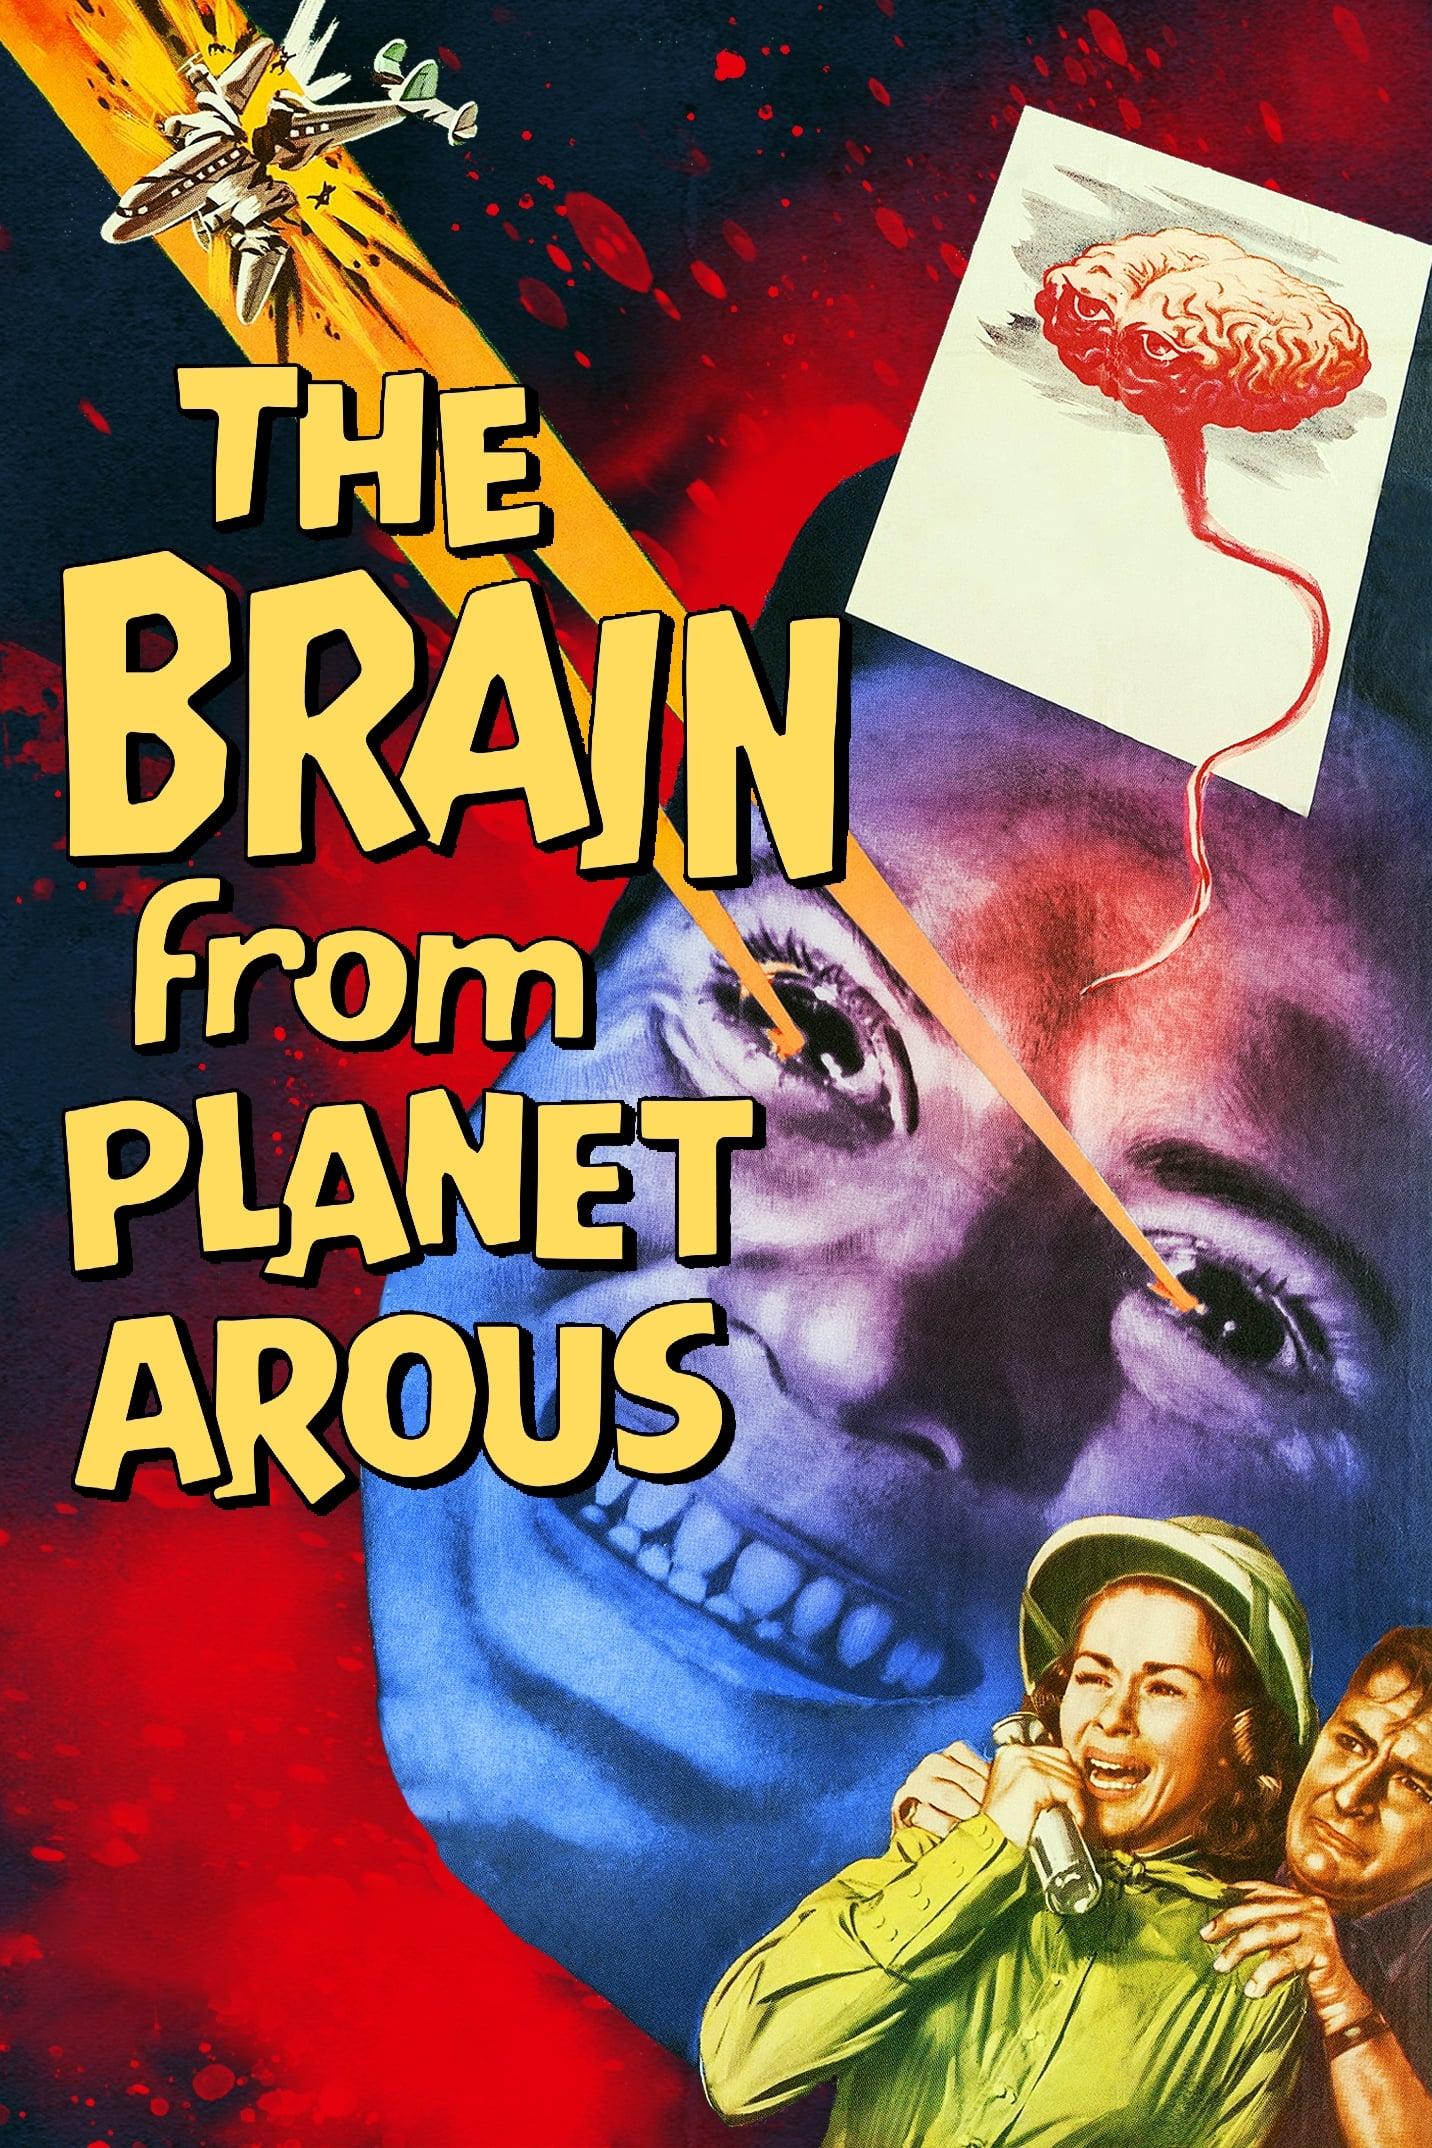 El Cerebro del Planeta Arous